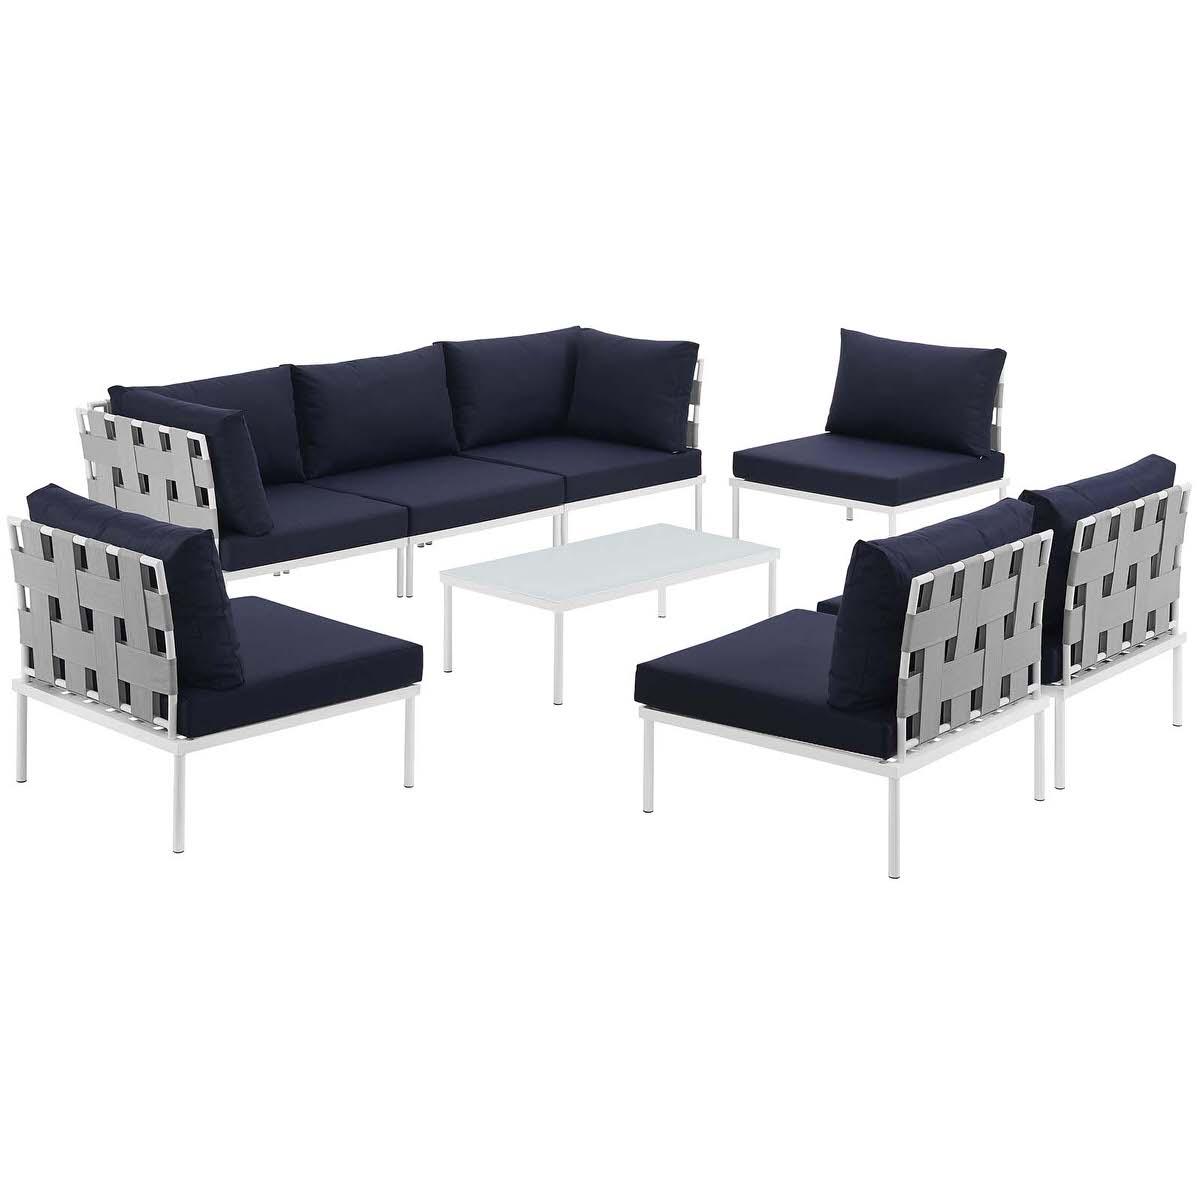 Harmony 8 Piece Outdoor Patio Aluminum Sectional Sofa Set White Navy ...